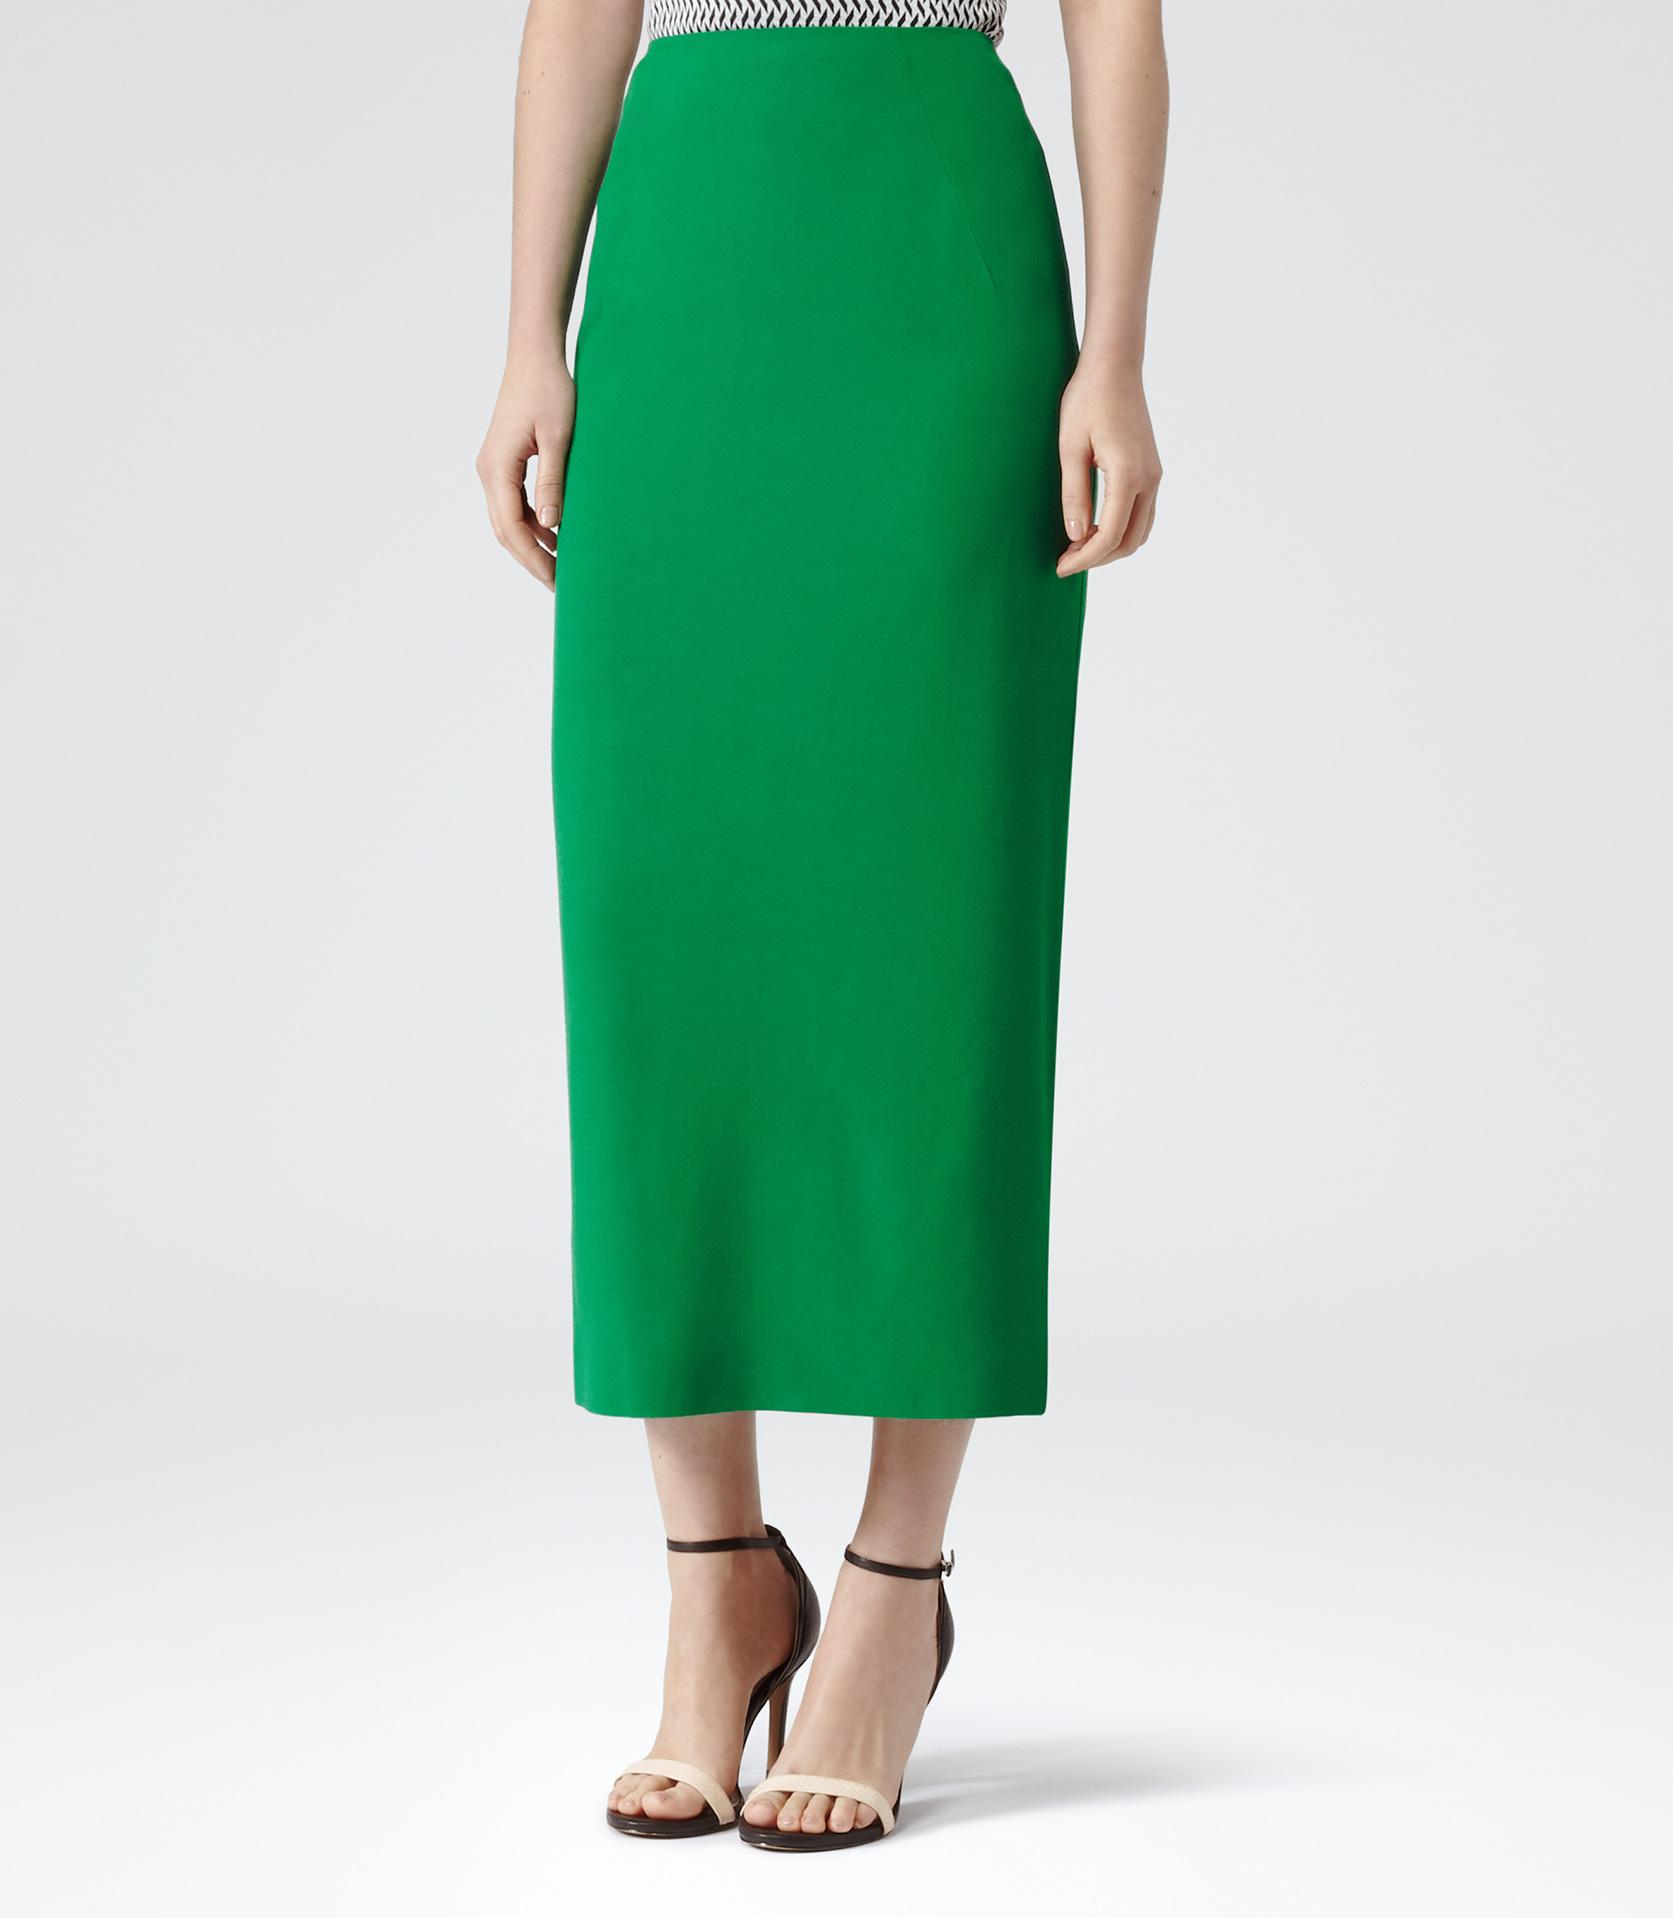 Reiss Bryant Straight Midi Skirt in Green | Lyst